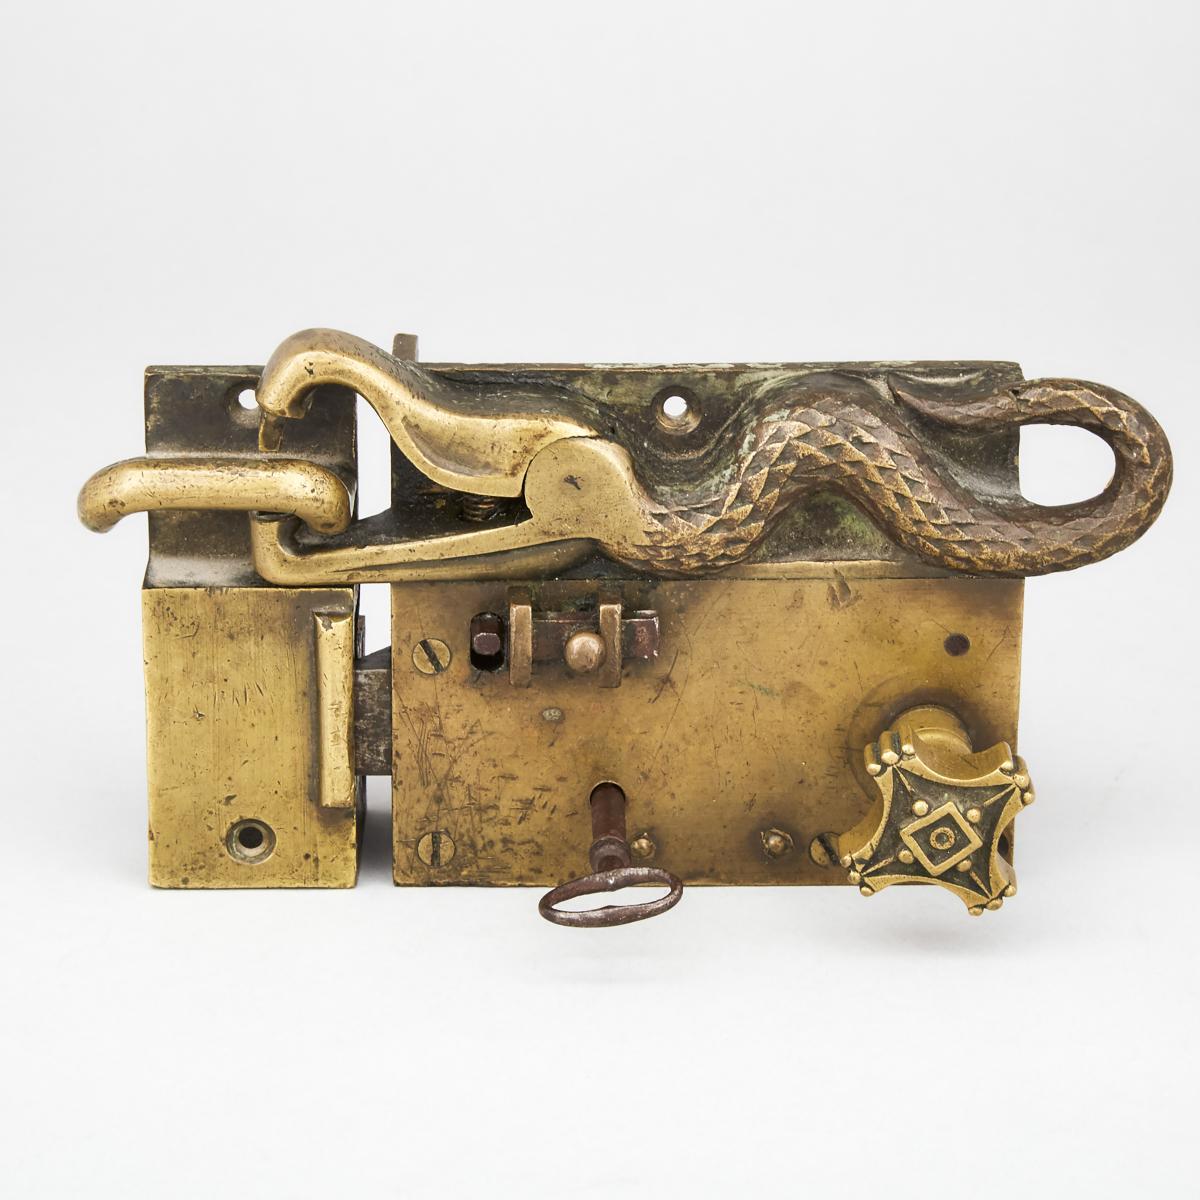 Serpent Form Brass Door Lockset, 18th century or earlier, 3.9 x 7.9 in — 10 x 20 cm